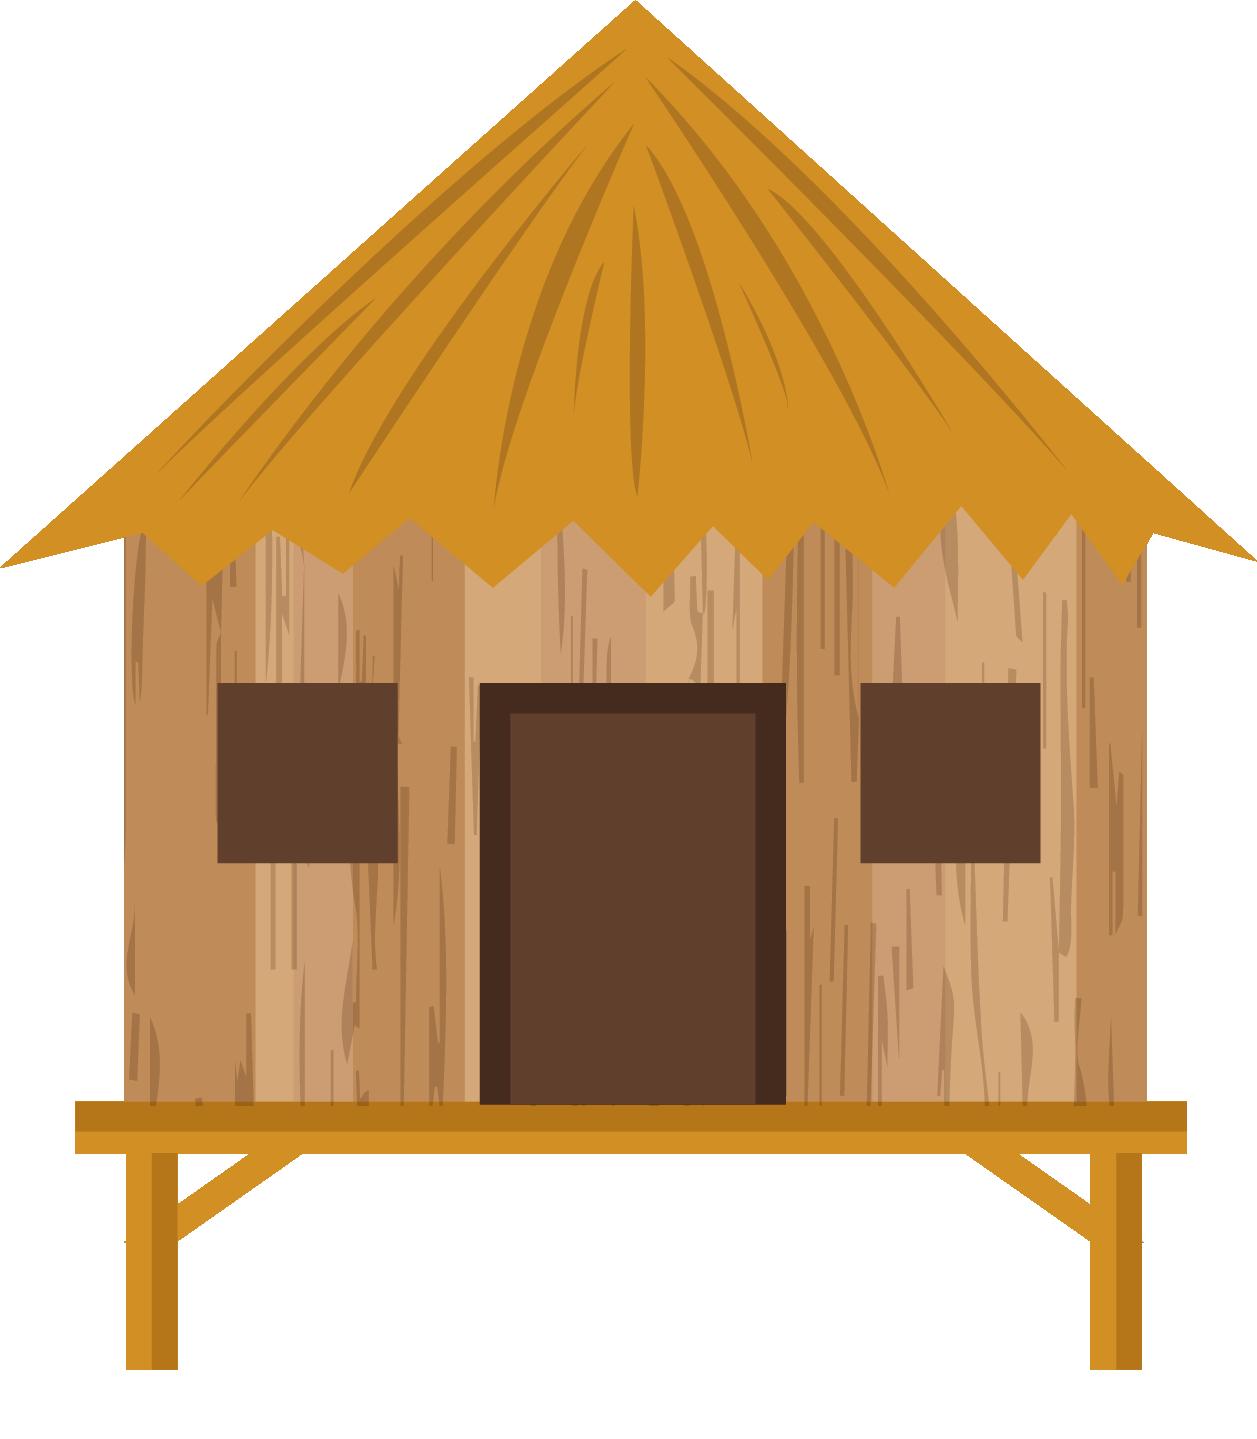 Hut clipart straw house, Hut straw house Transparent FREE ...